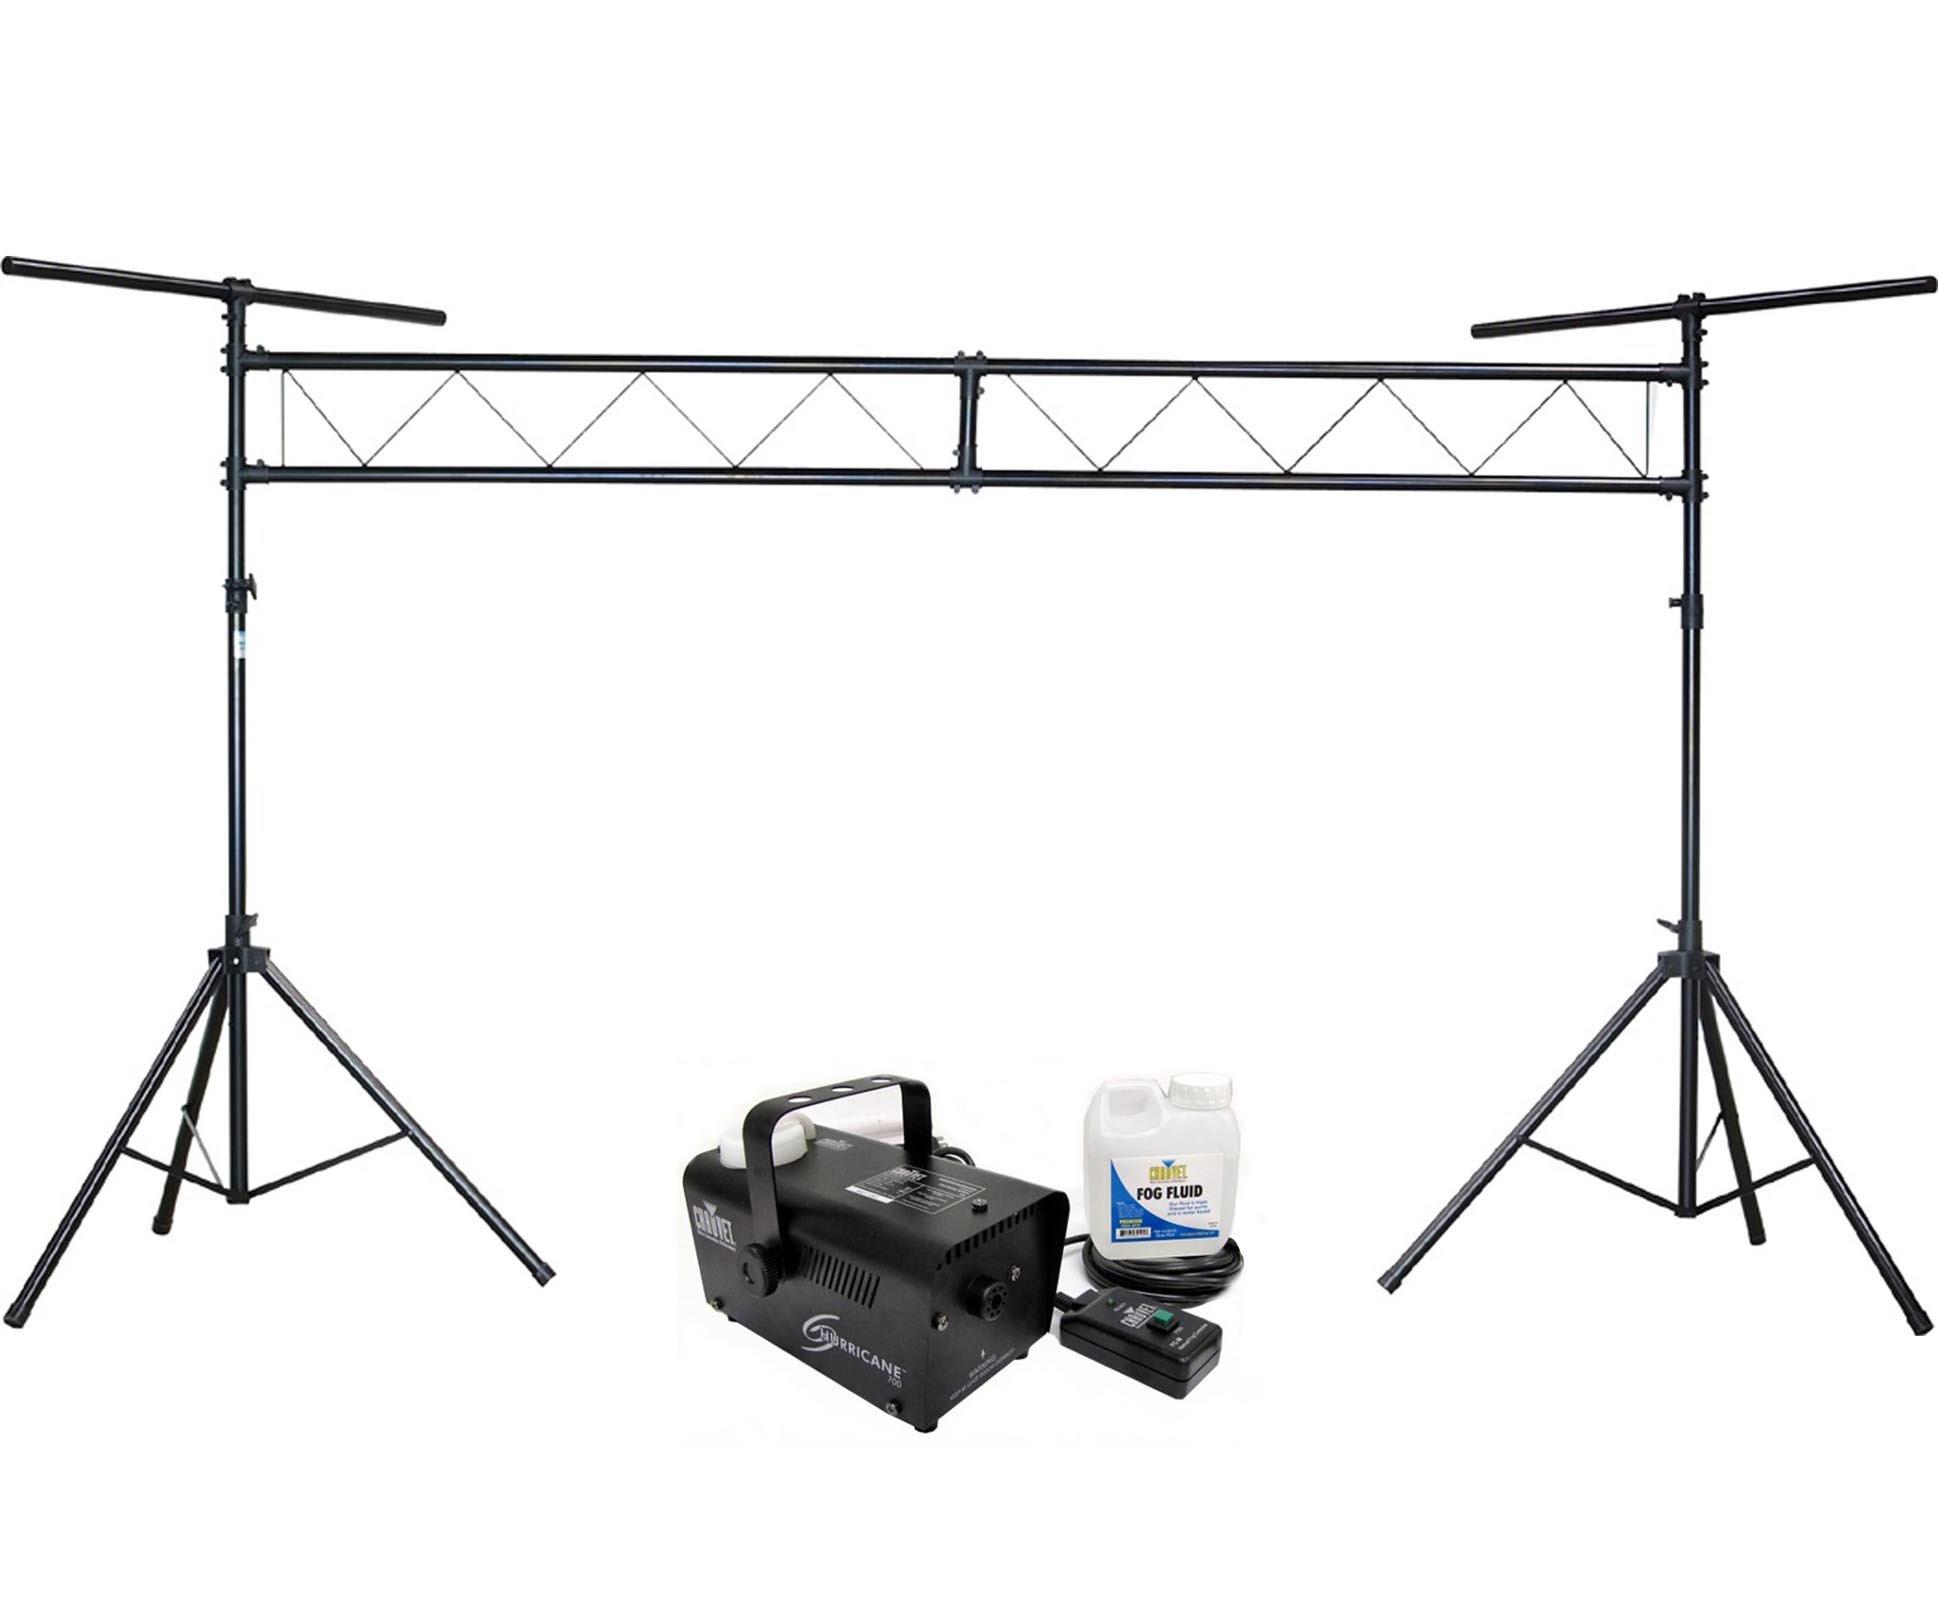 CHAUVET Hurricane H700 Fog/ Smoke Pro Machine H-700 + CH-31 DJ Truss Light Stand